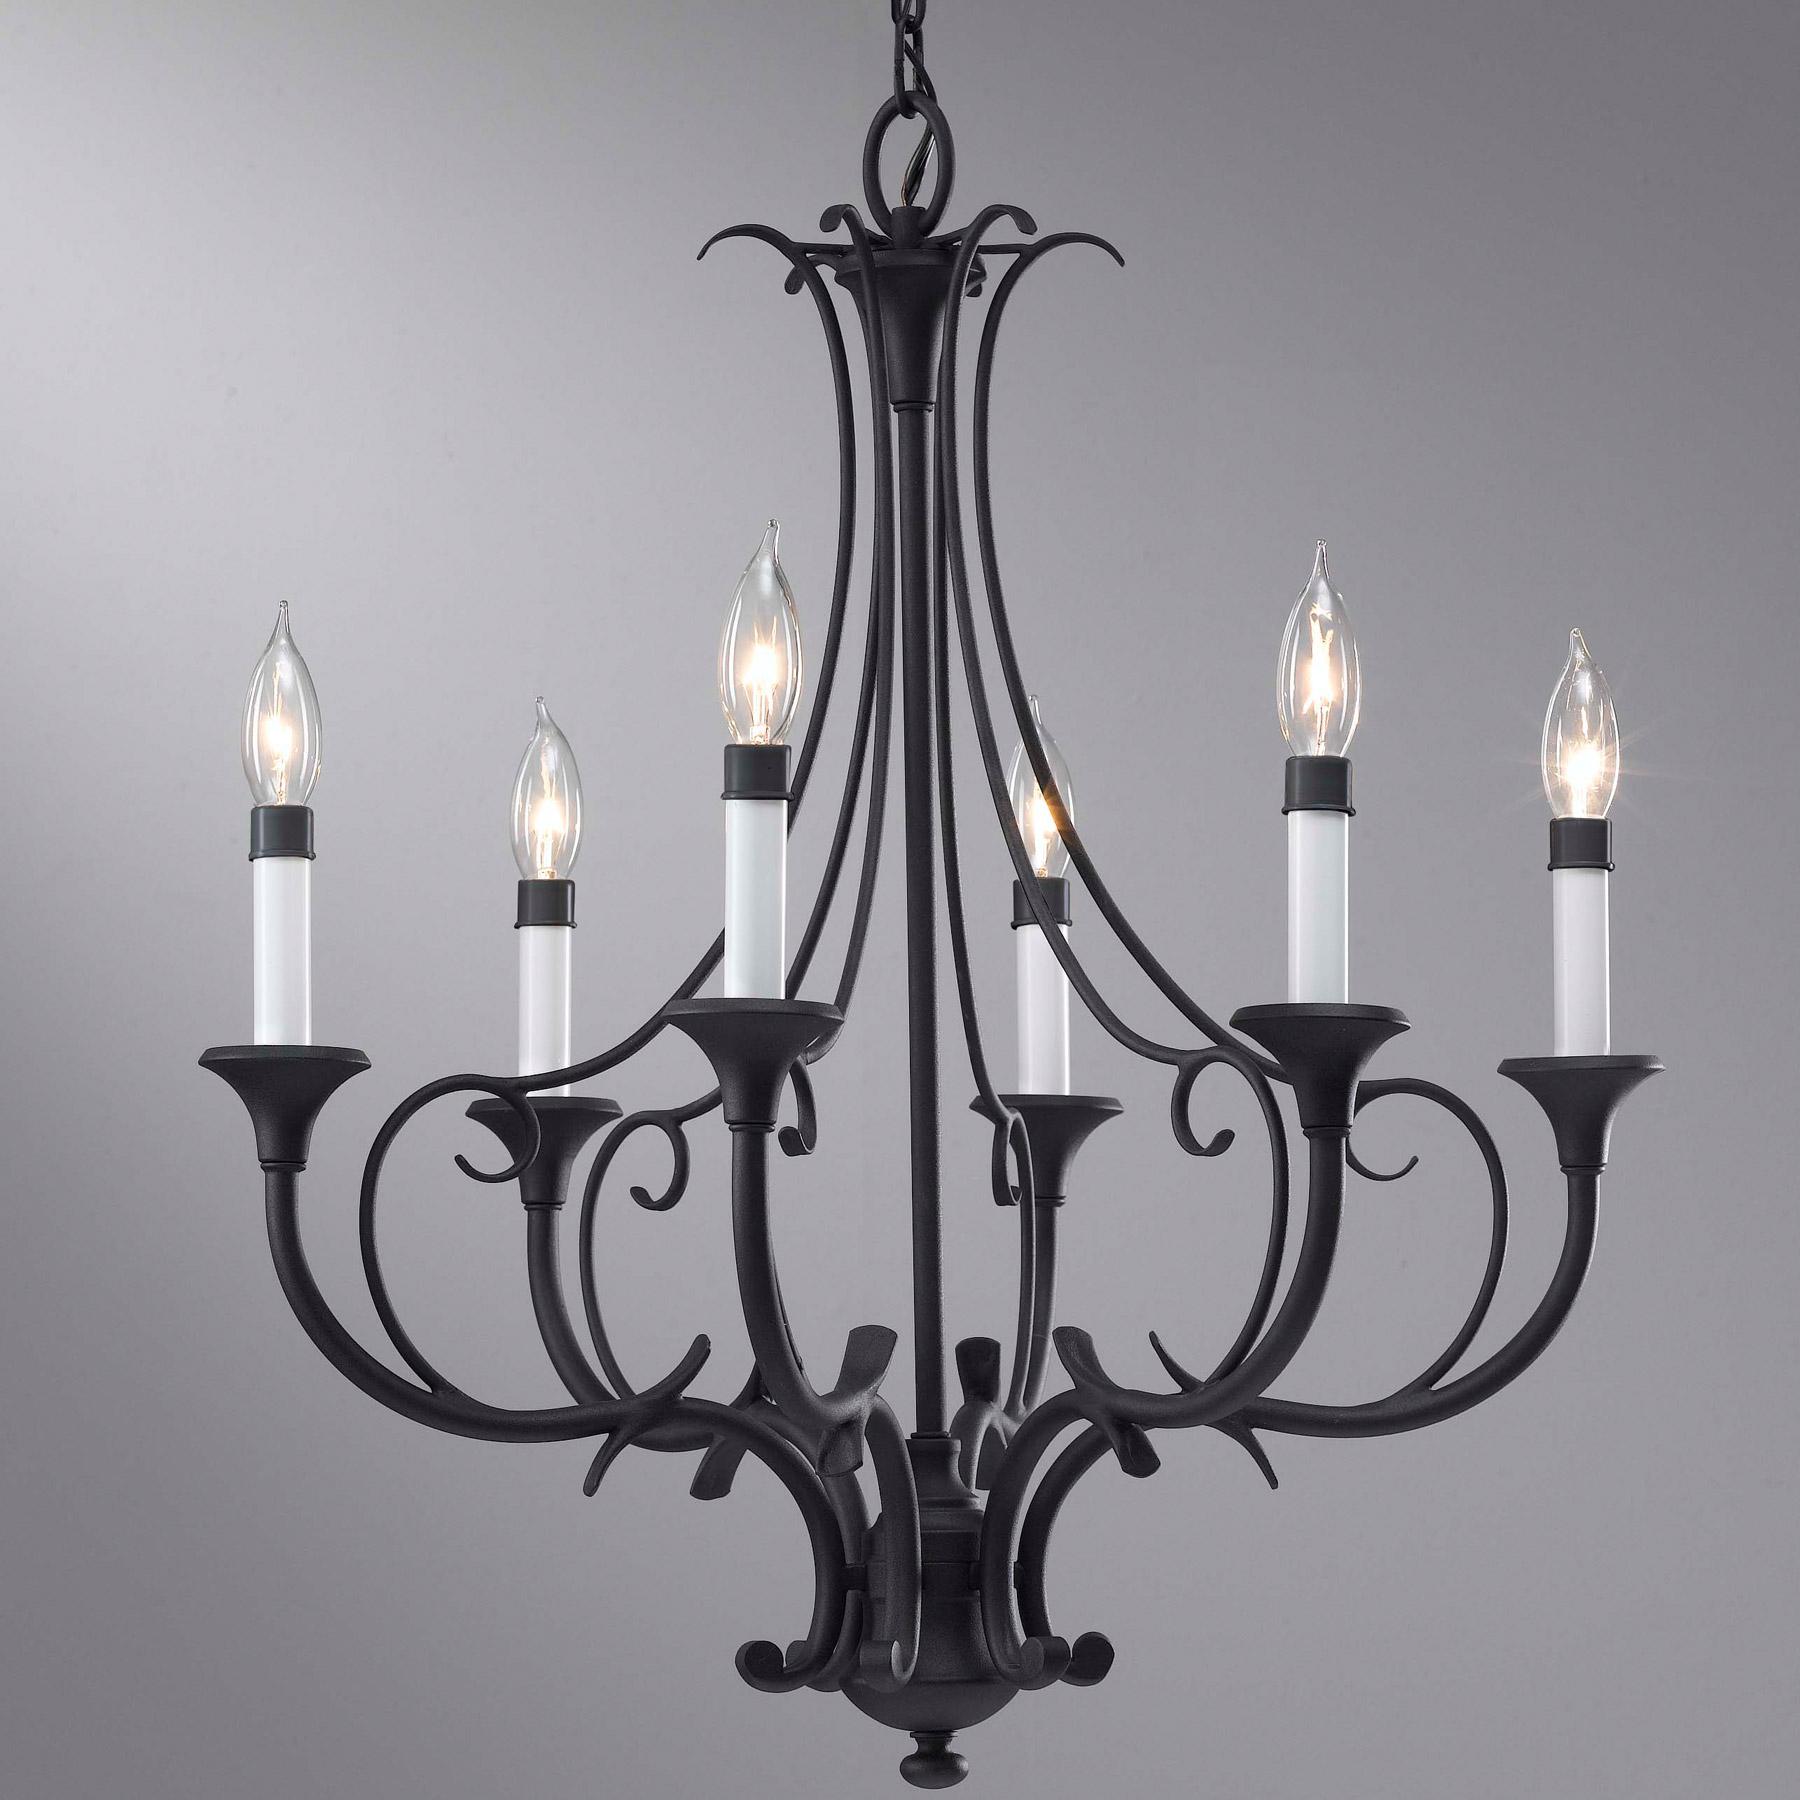 F25336bk peyton six light chandelier feiss f25336bk peyton six light chandelier arubaitofo Choice Image